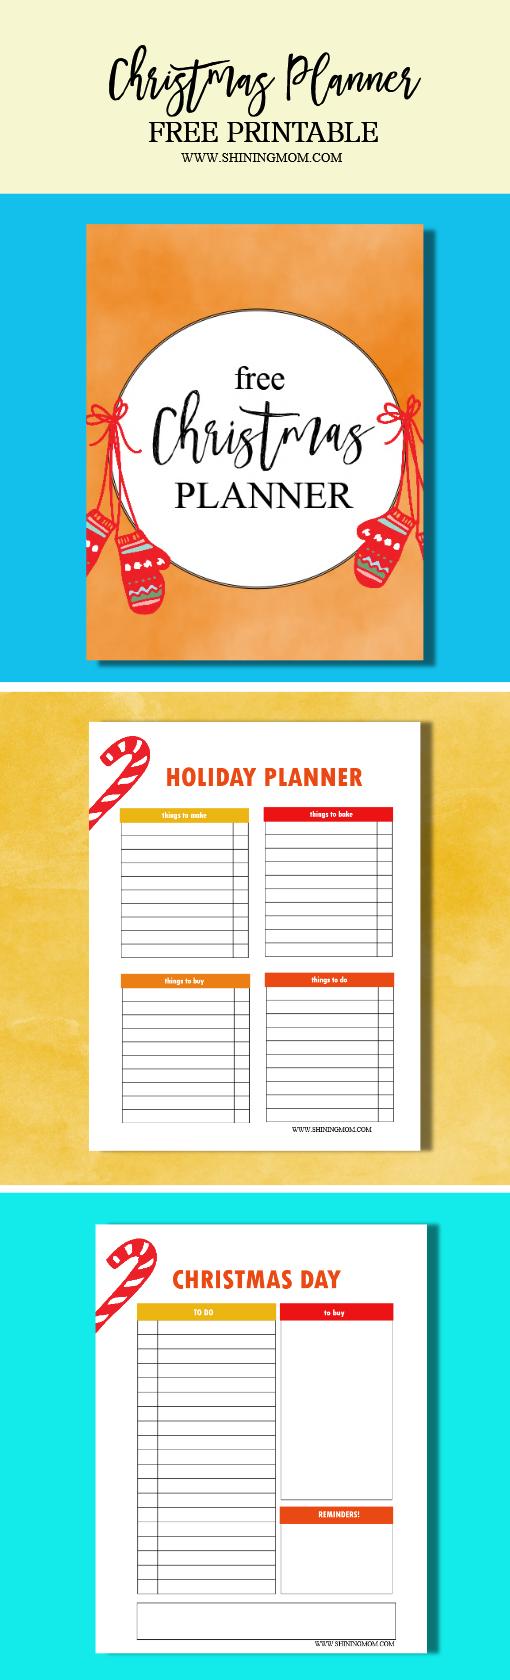 free-printable-christmas-planner-pinterest